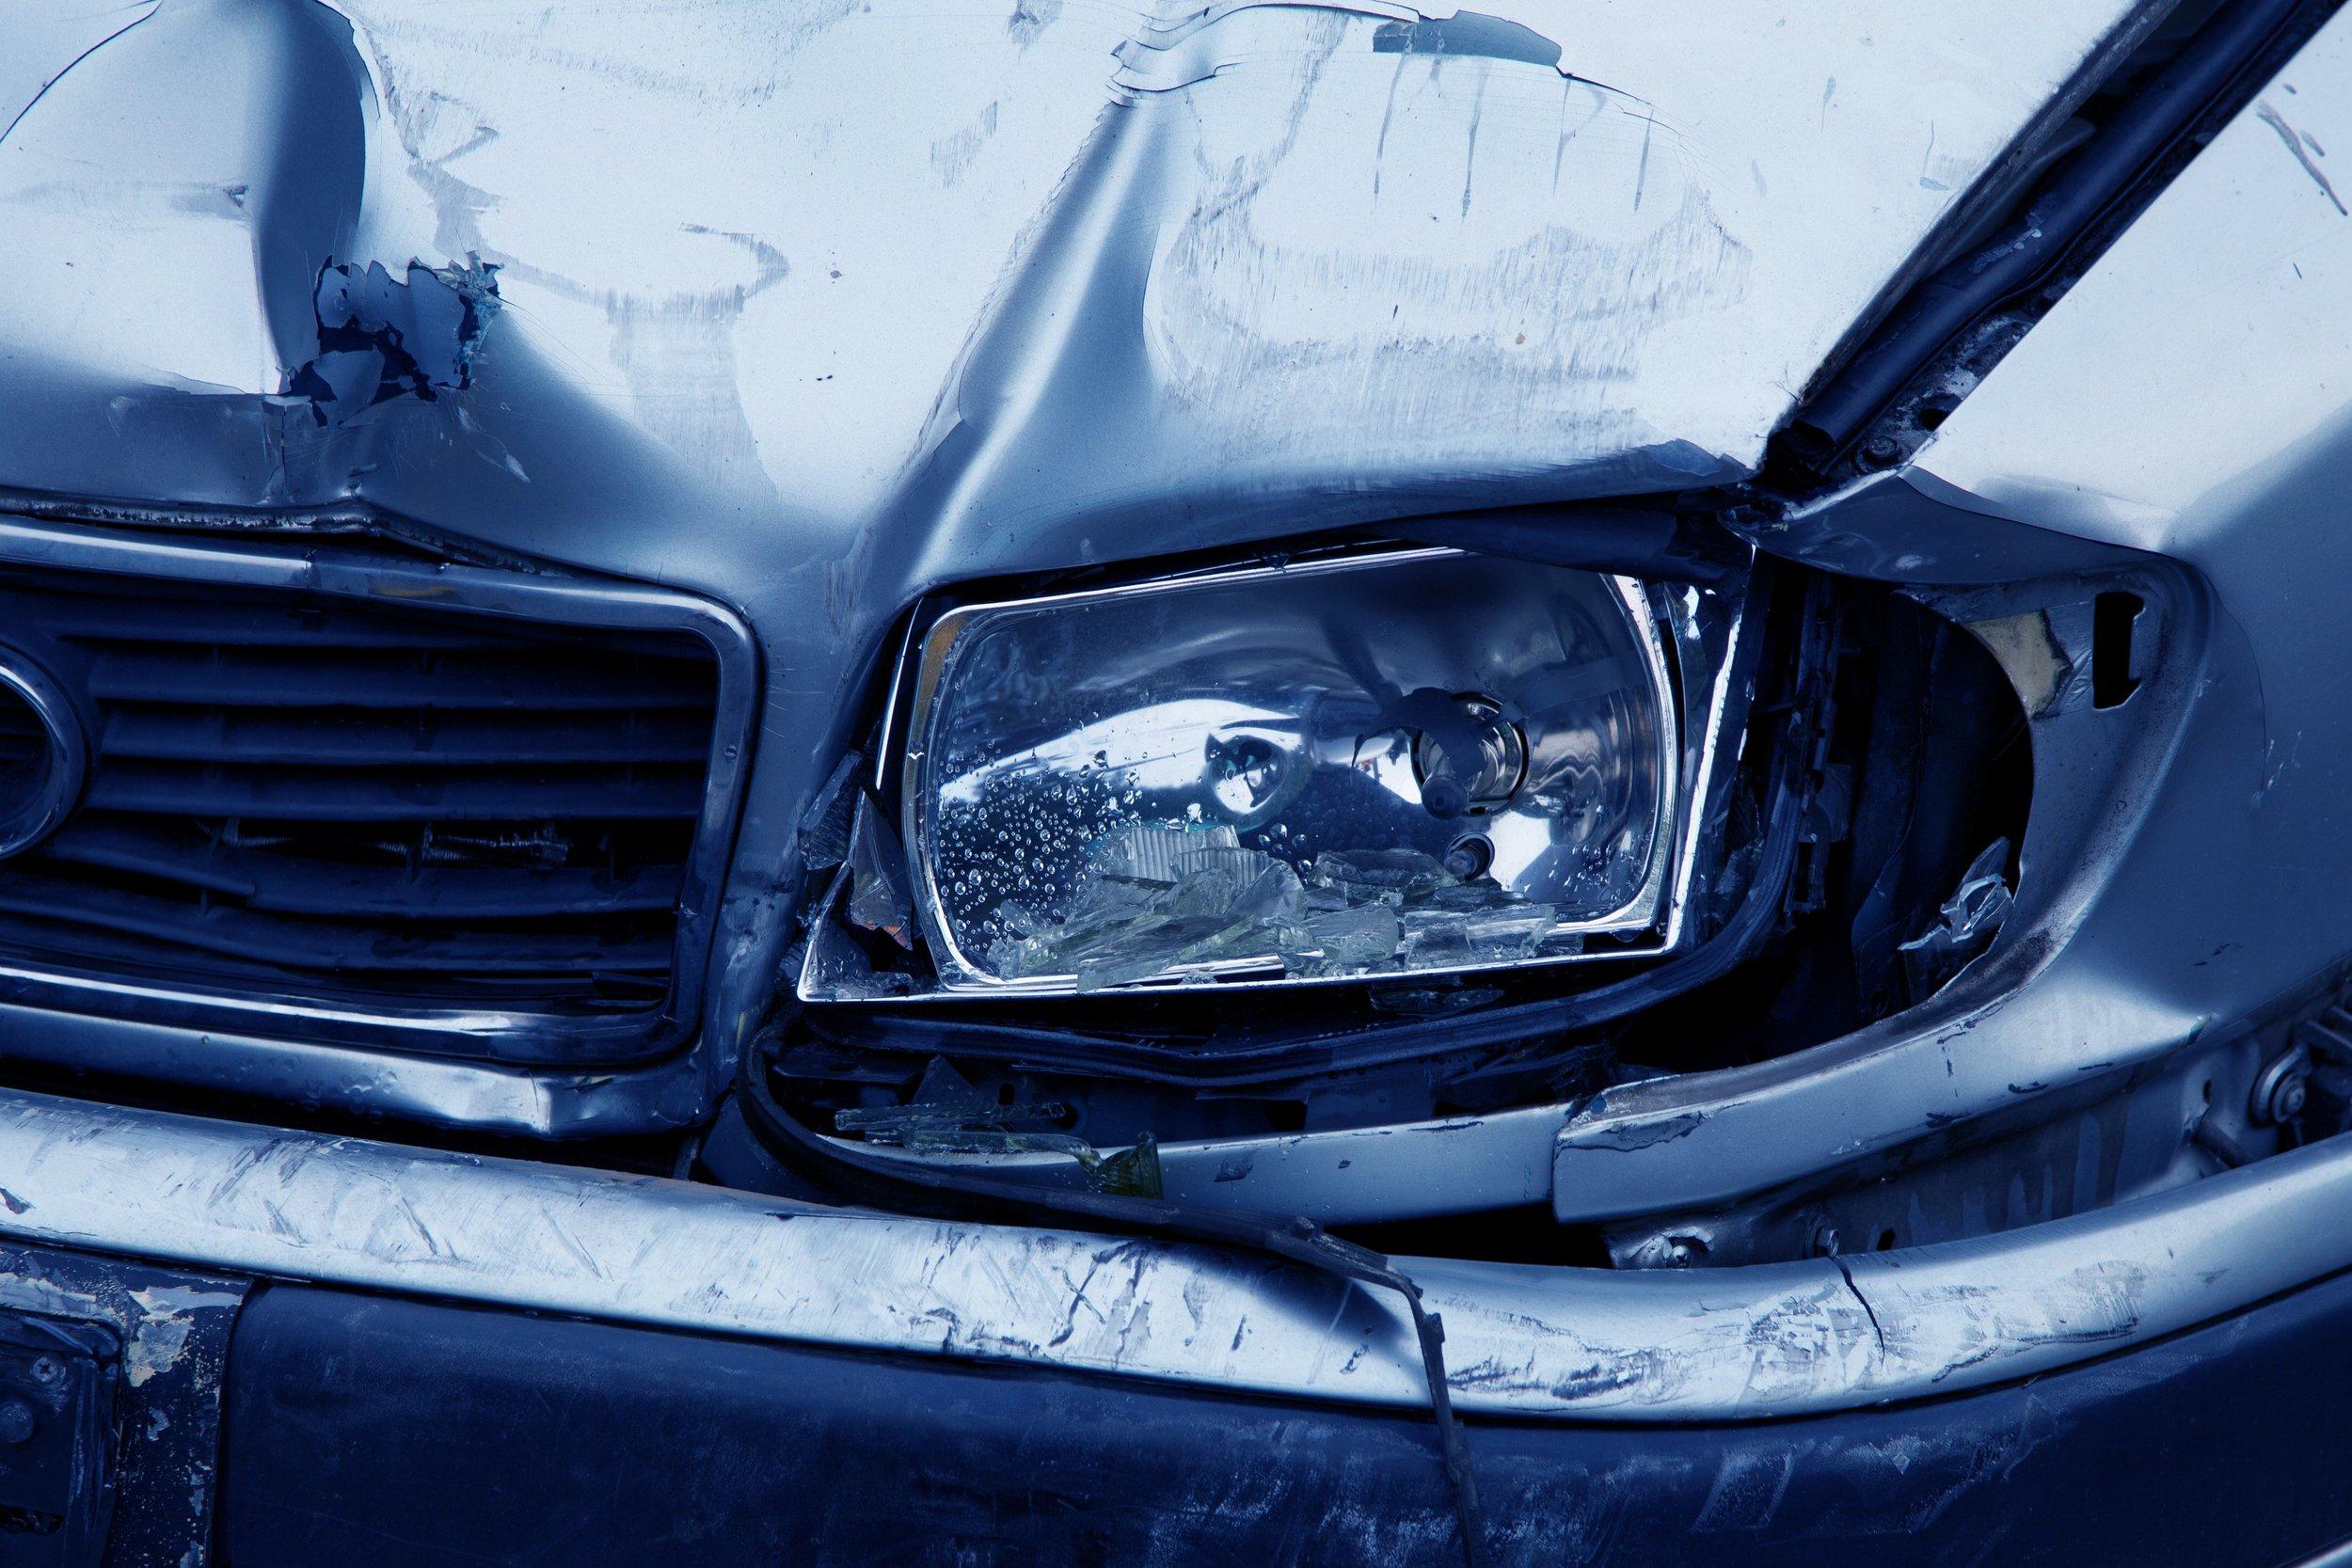 Damaged car headlight